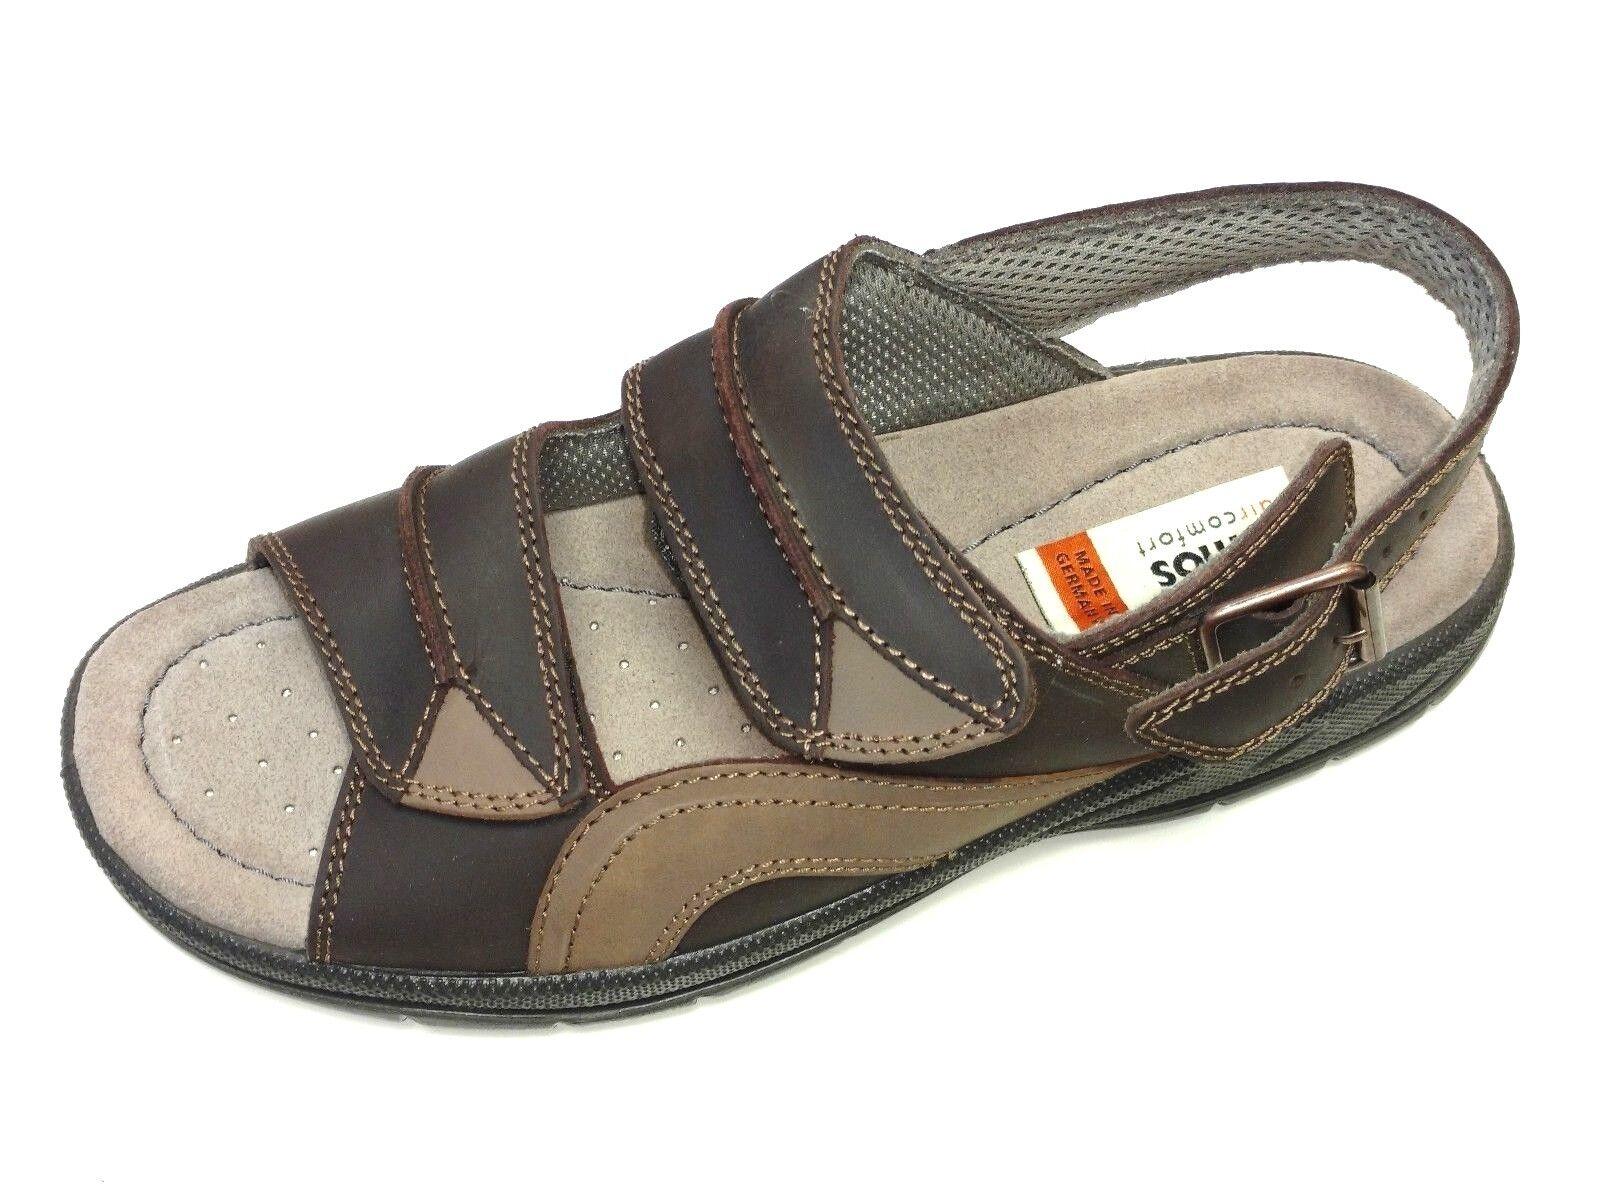 Jomos Herren Schuhe Sandale Sandalette 503620 65 3121 Leder braun Weite H